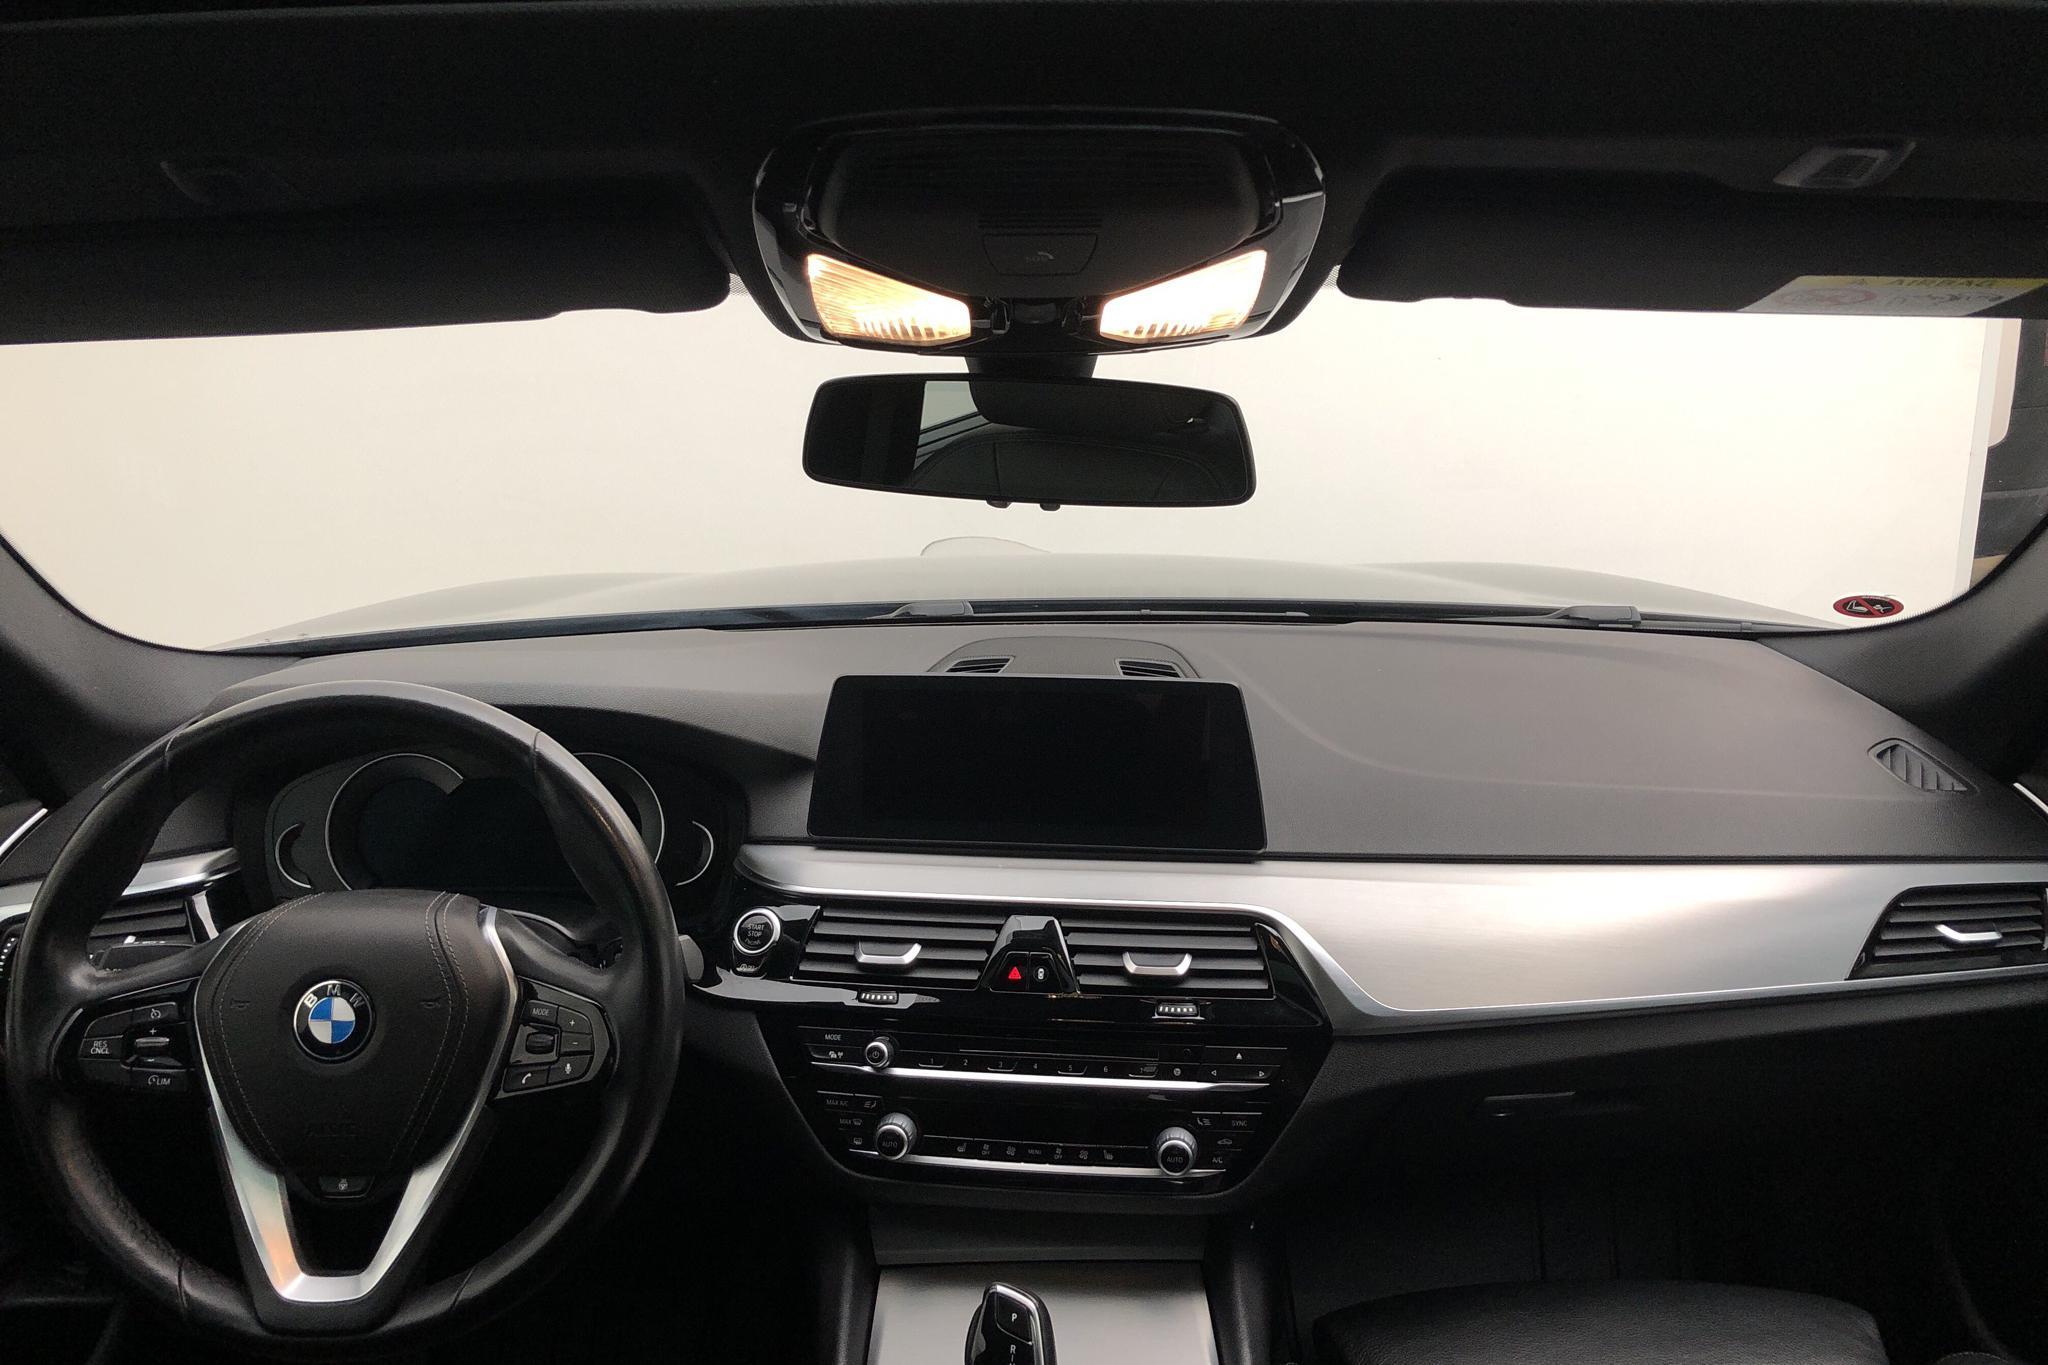 BMW 520d Touring, G31 (190hk) - 9 065 mil - Automat - svart - 2018